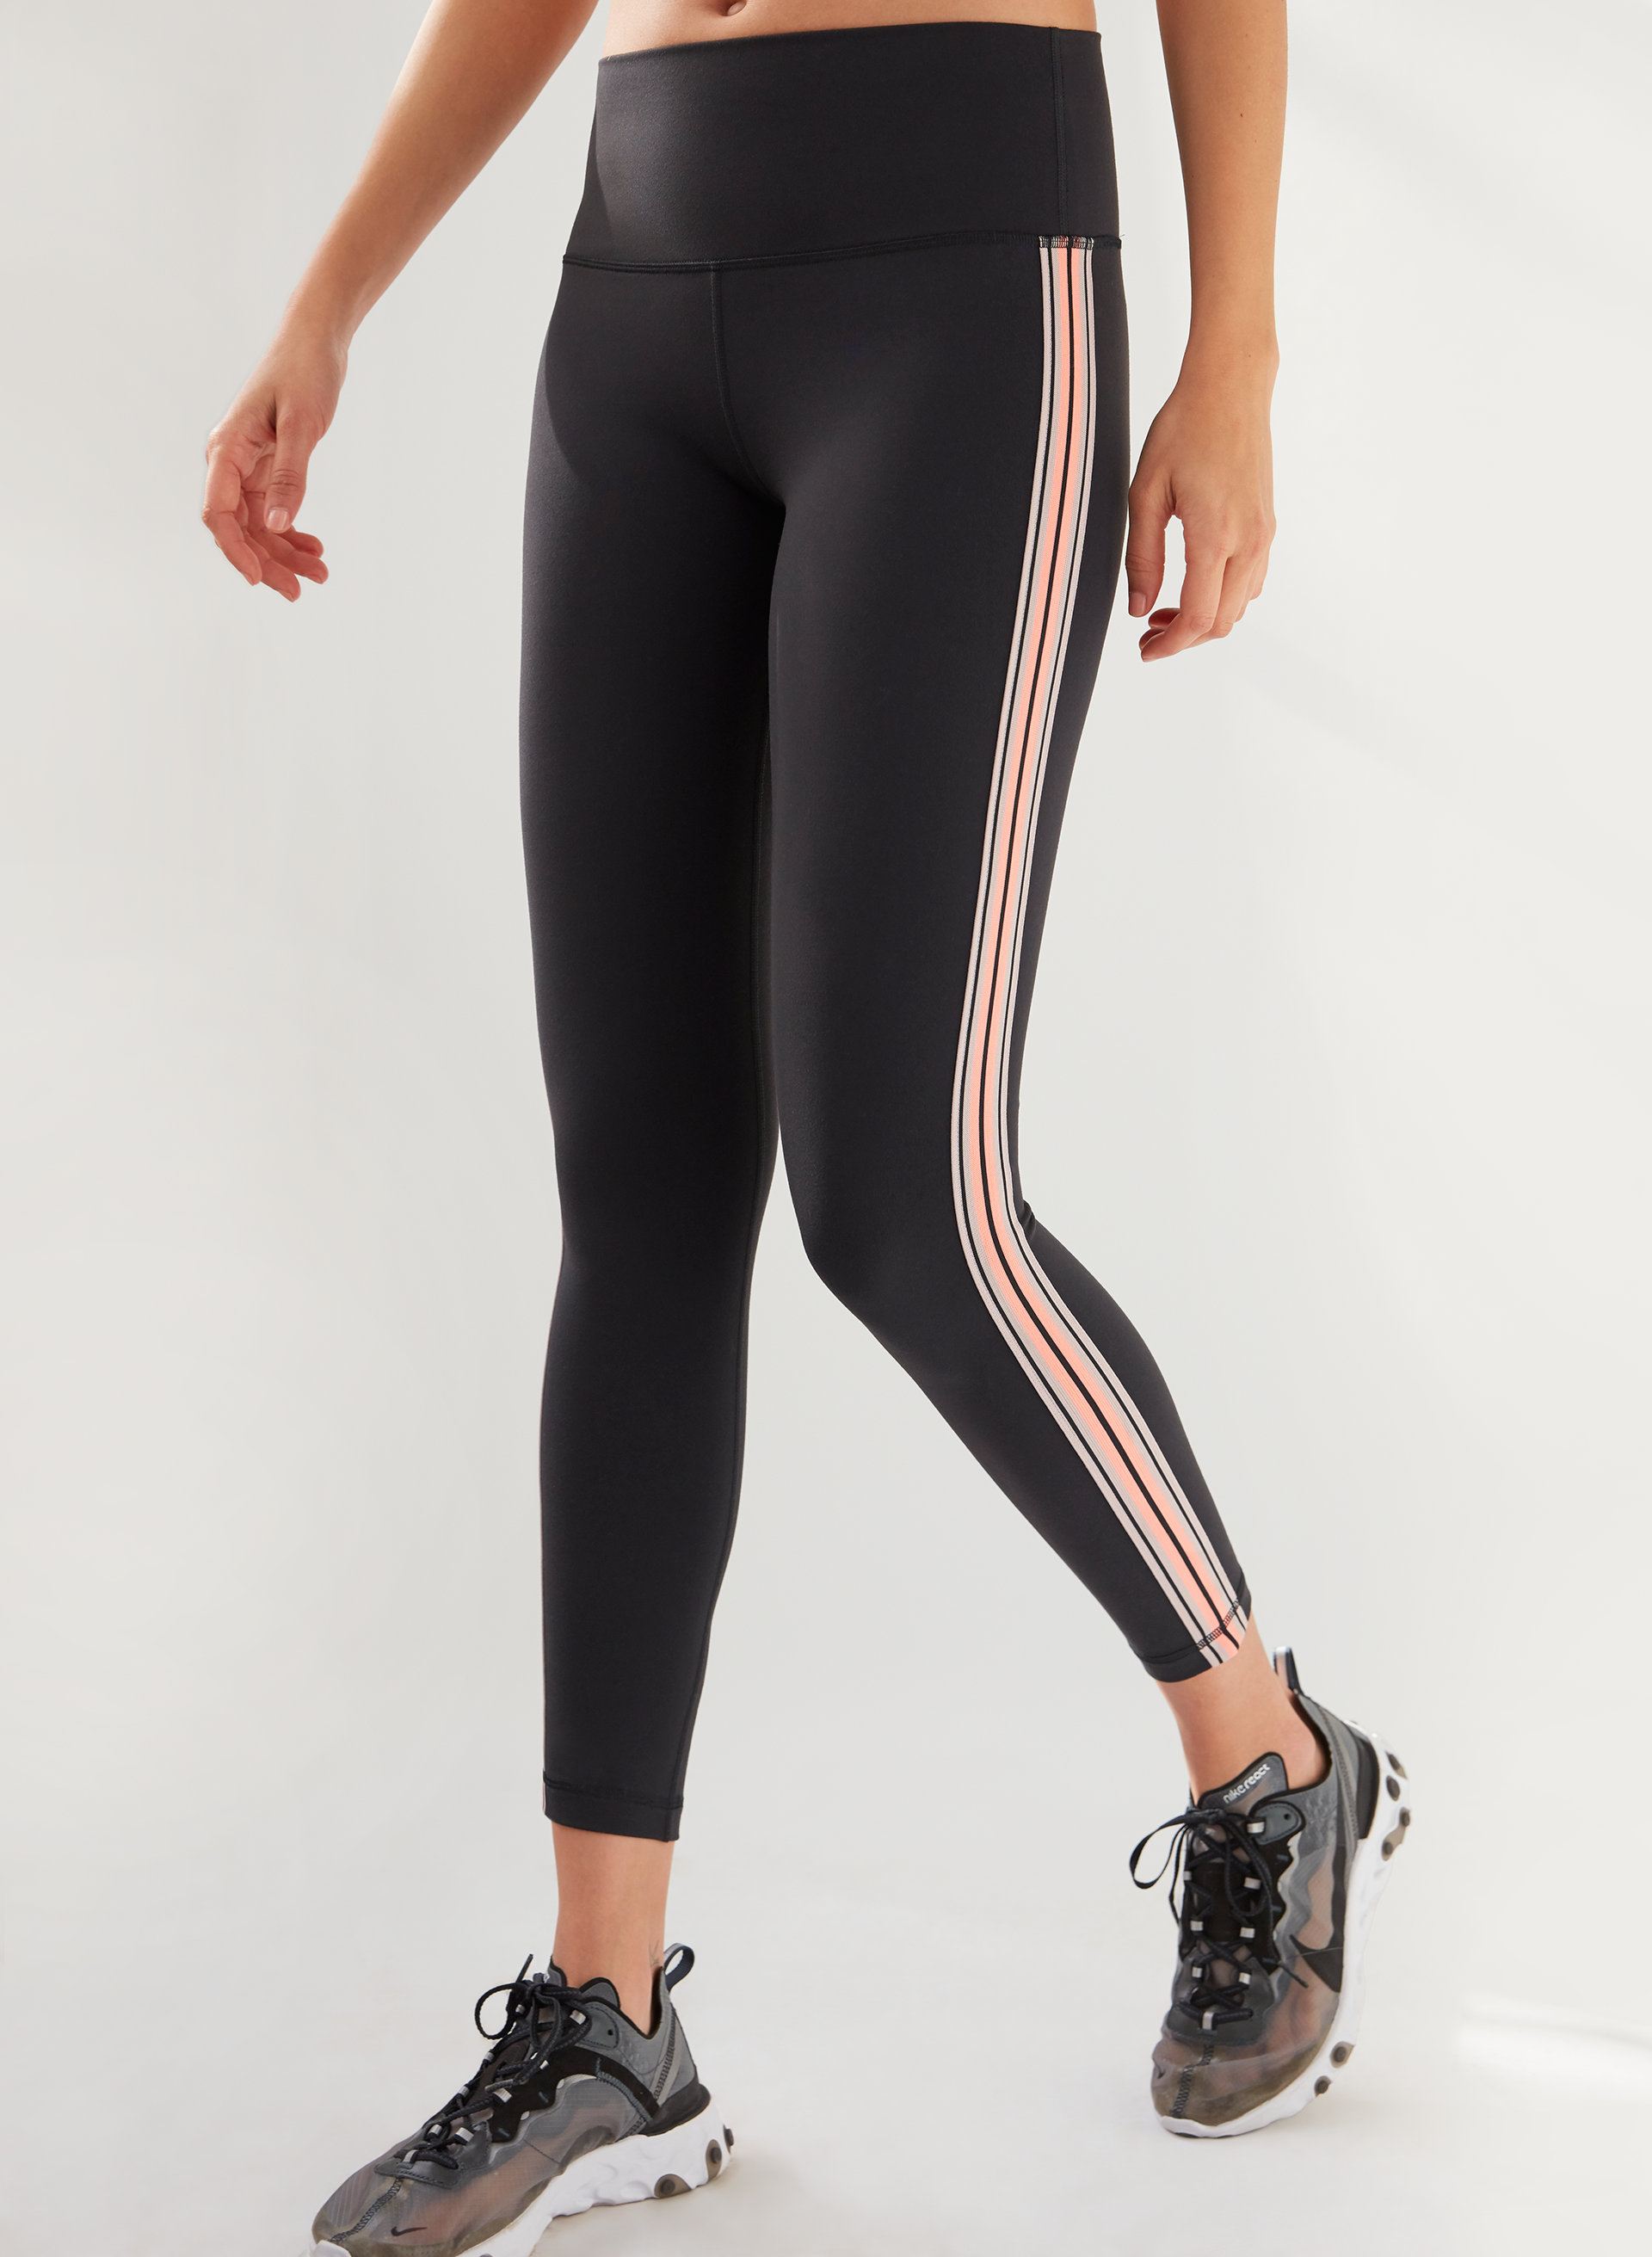 99df27fd00862 ATMOSPHERE LEGGING - High-waisted legging with side stripe